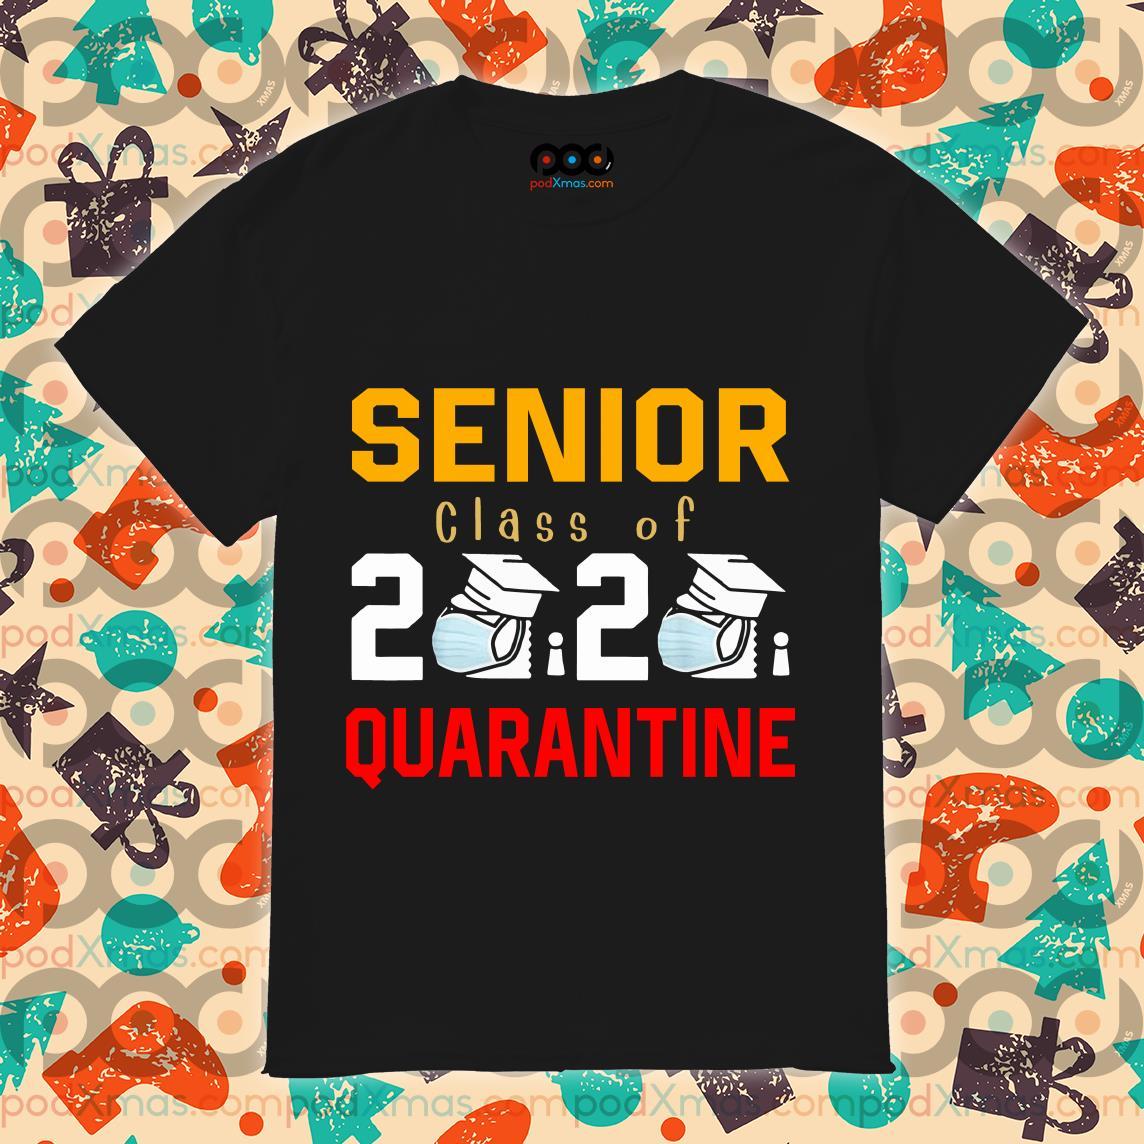 Senior Class of 2020 Quarantine Graduation Shirt Toilet Paper T-Shirt